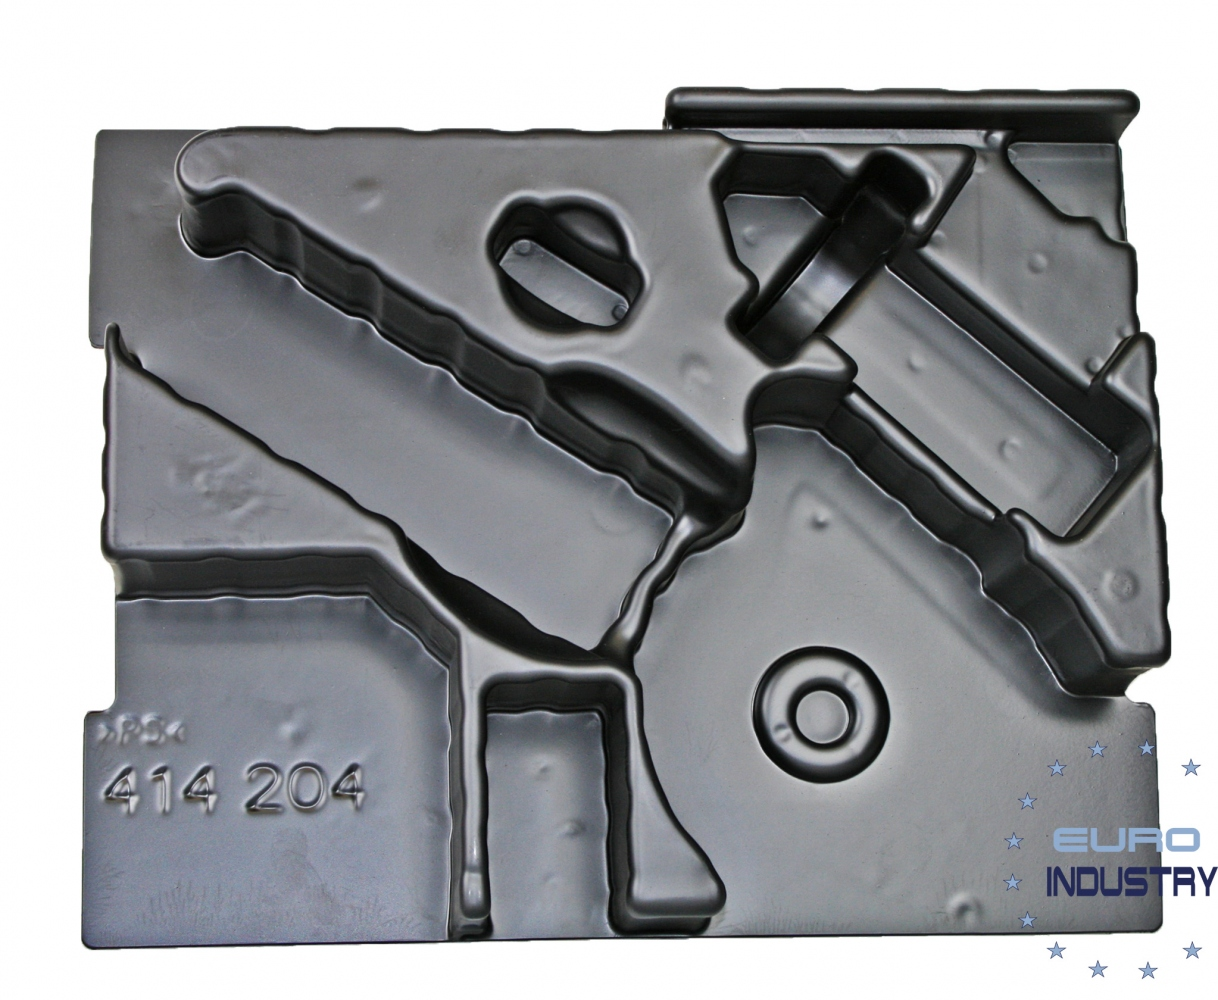 flex 414 204 case insert for tke 1 hd online purchase euro industry